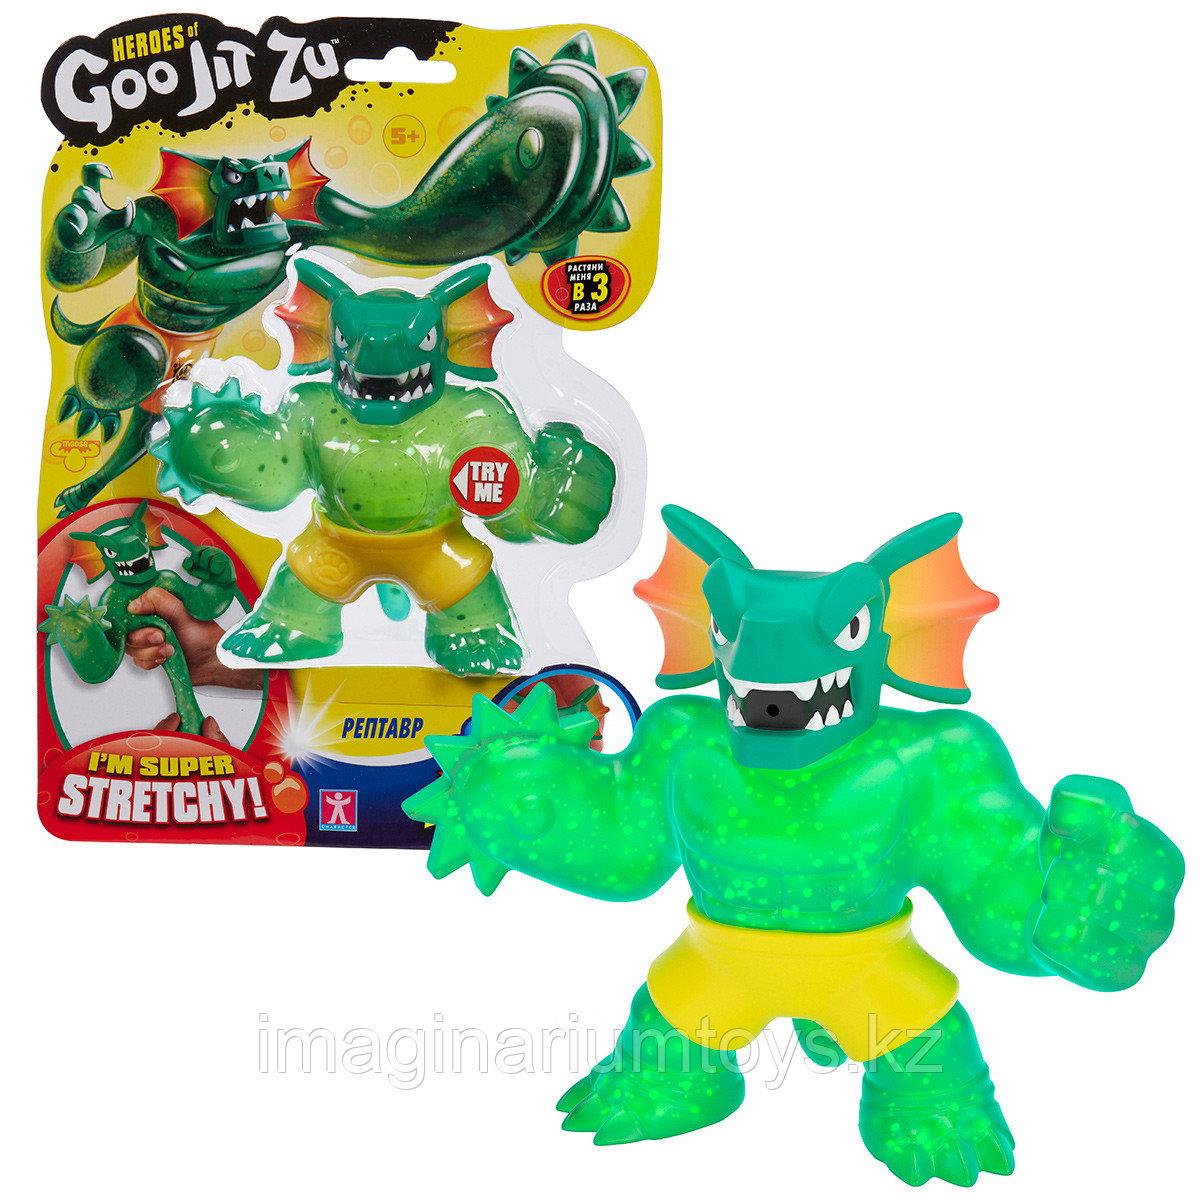 Гуджитсу Динозавр Рептавр Водная атака Goo Jit Zu - фото 1